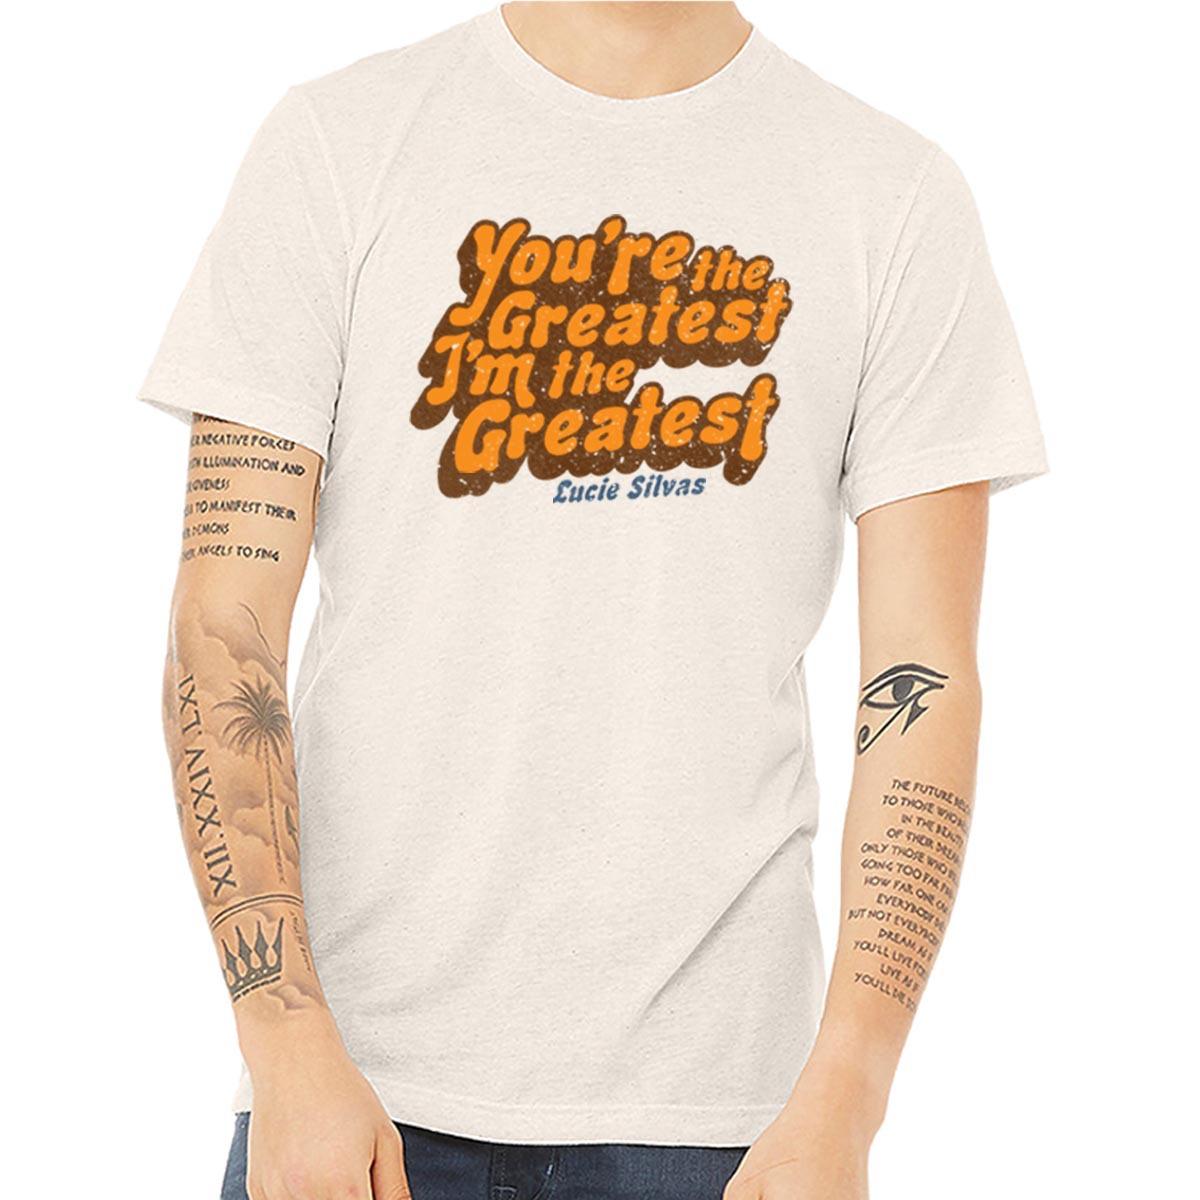 Greatest T-shirt